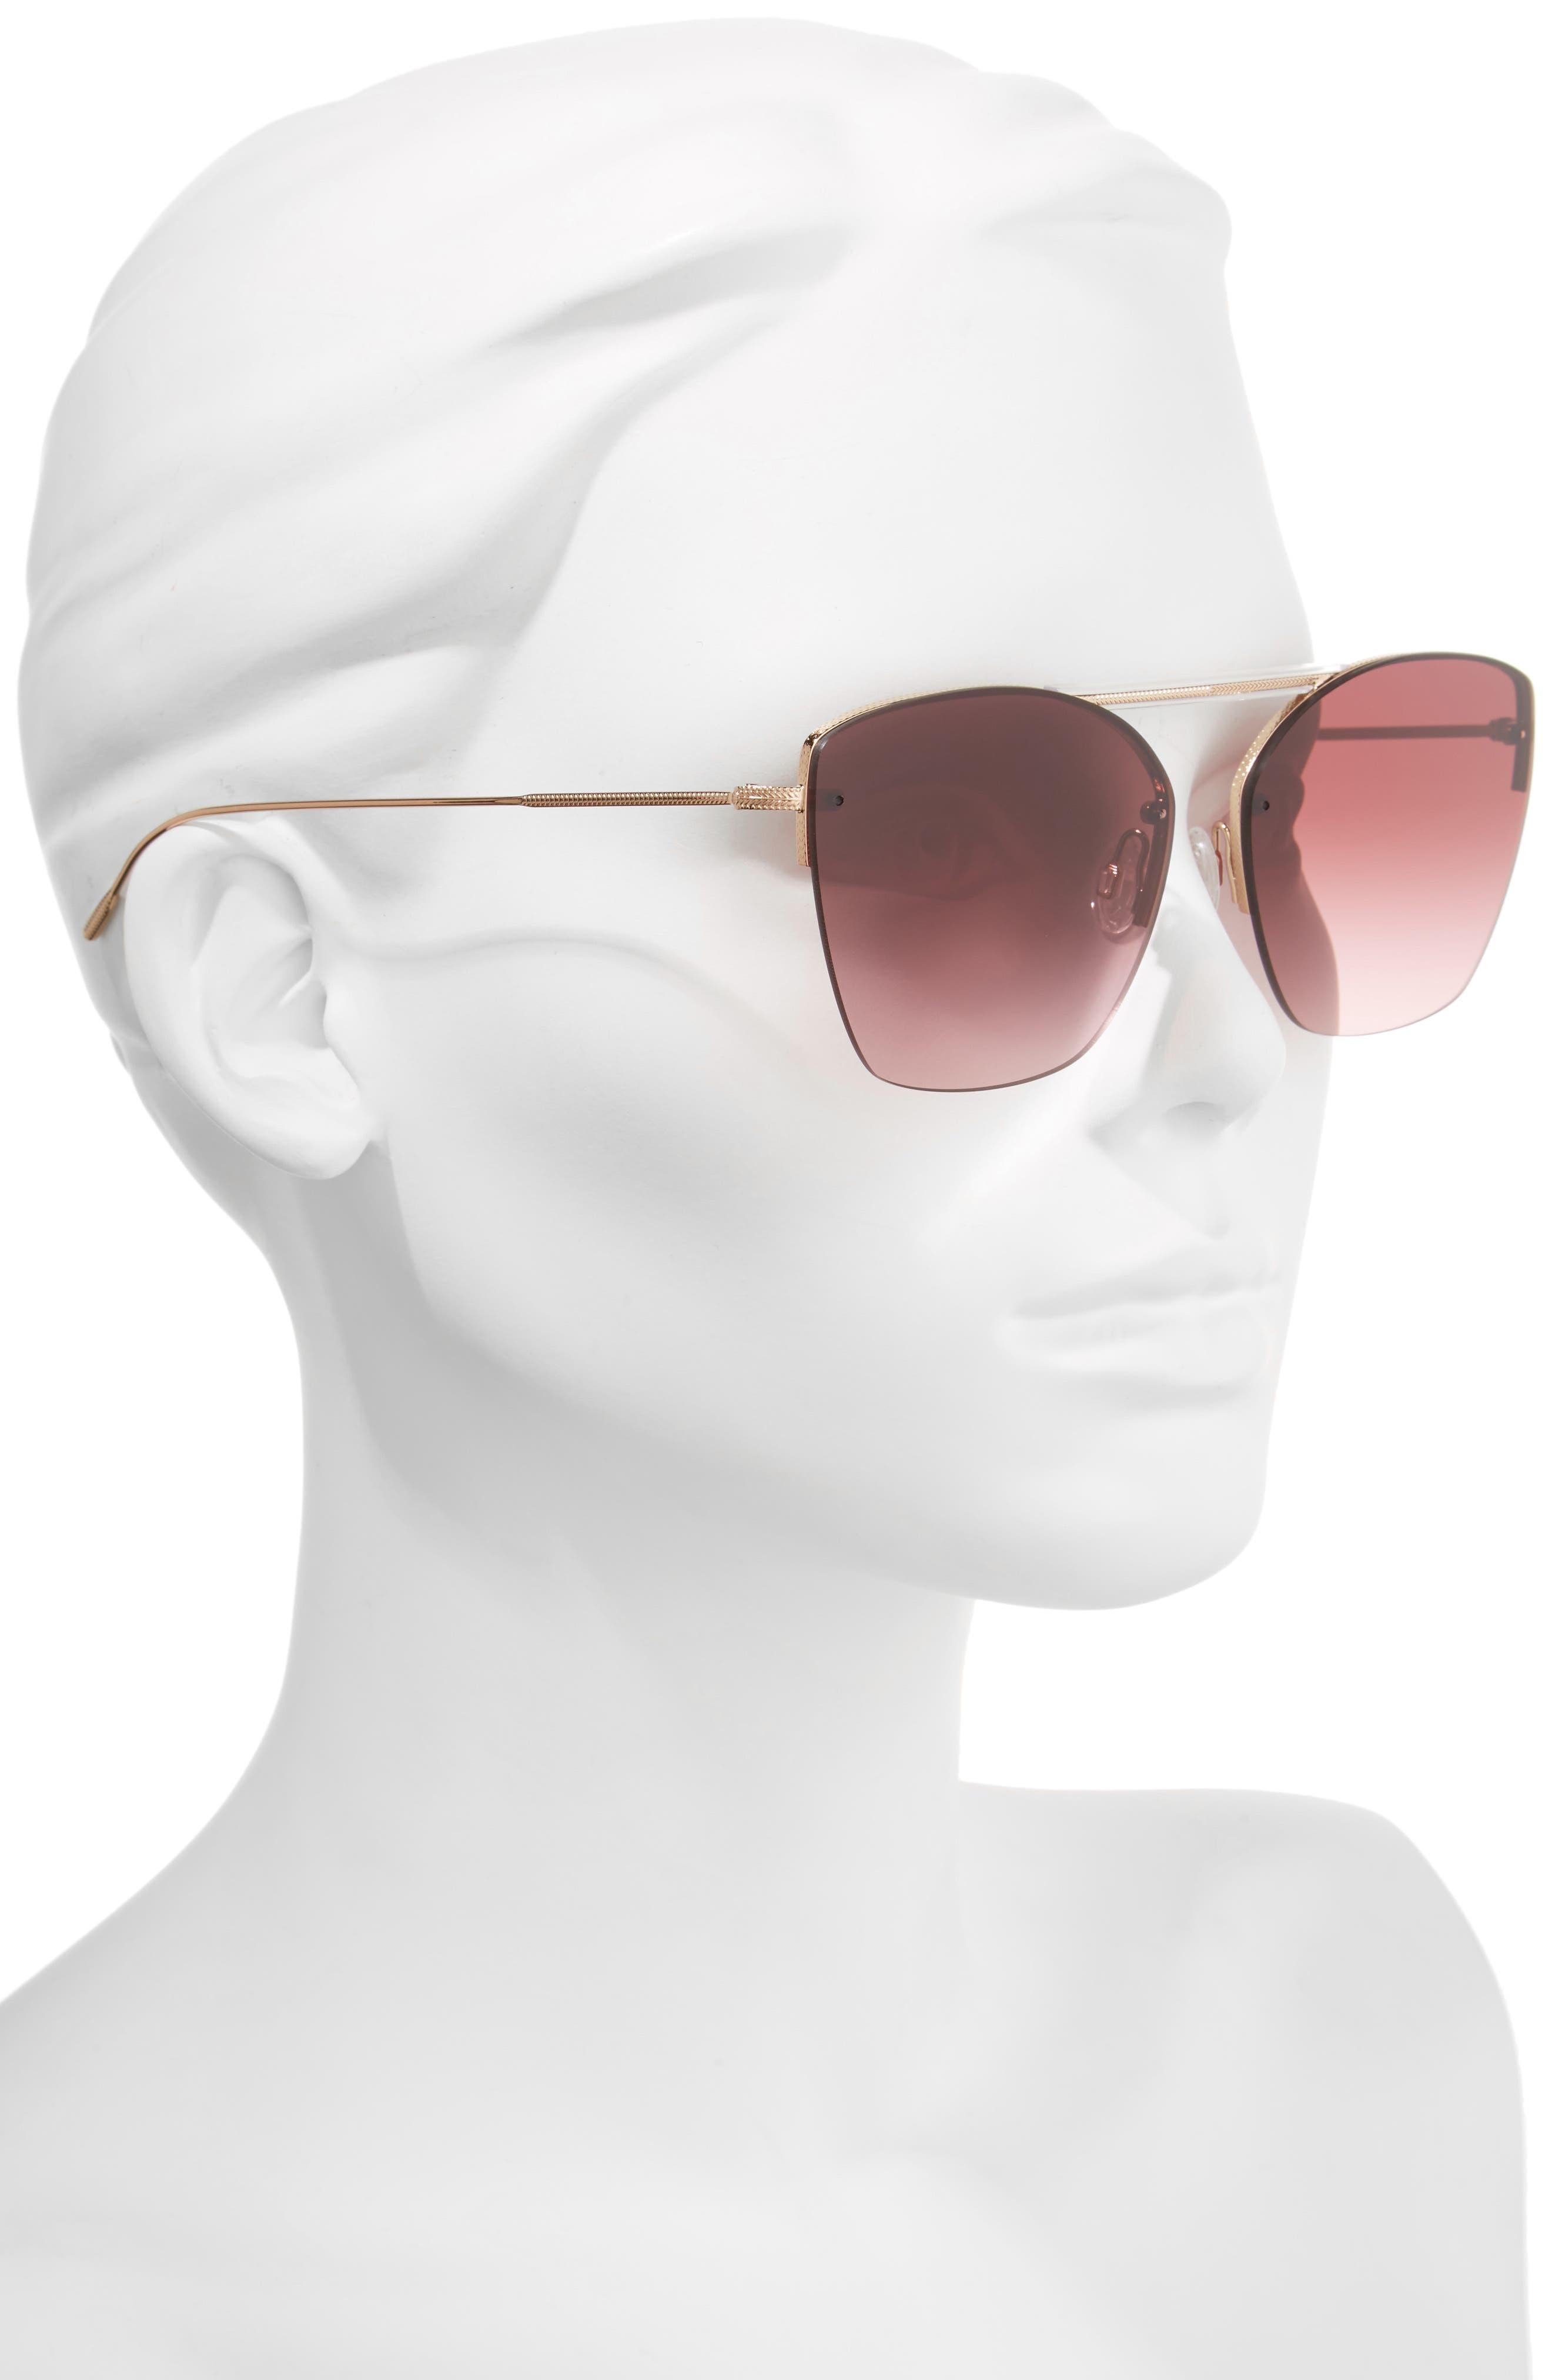 Ziane 61mm Rimless Sunglasses,                             Alternate thumbnail 2, color,                             650